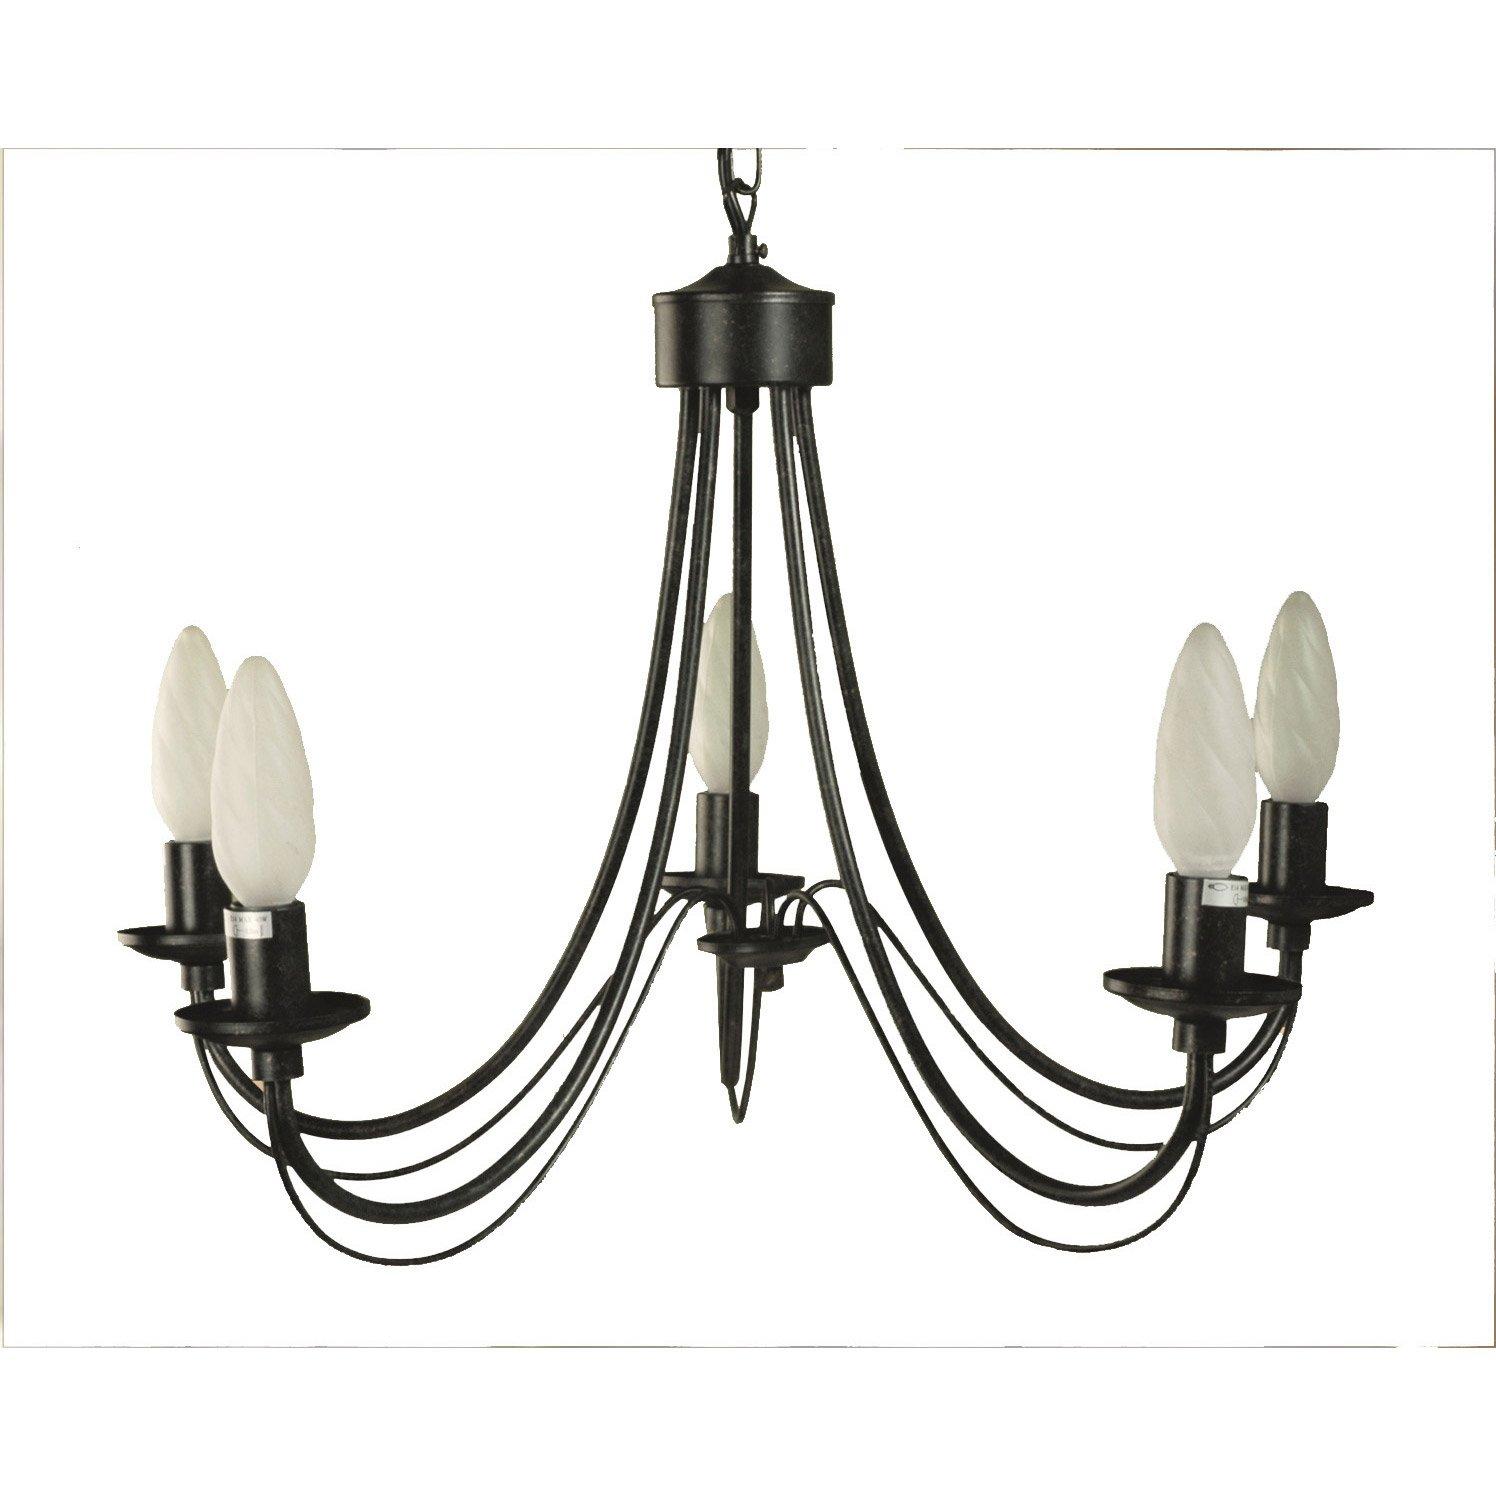 lustre e14 classique chic paimpol m tal rouille 5 x 40 w seynave leroy merlin. Black Bedroom Furniture Sets. Home Design Ideas